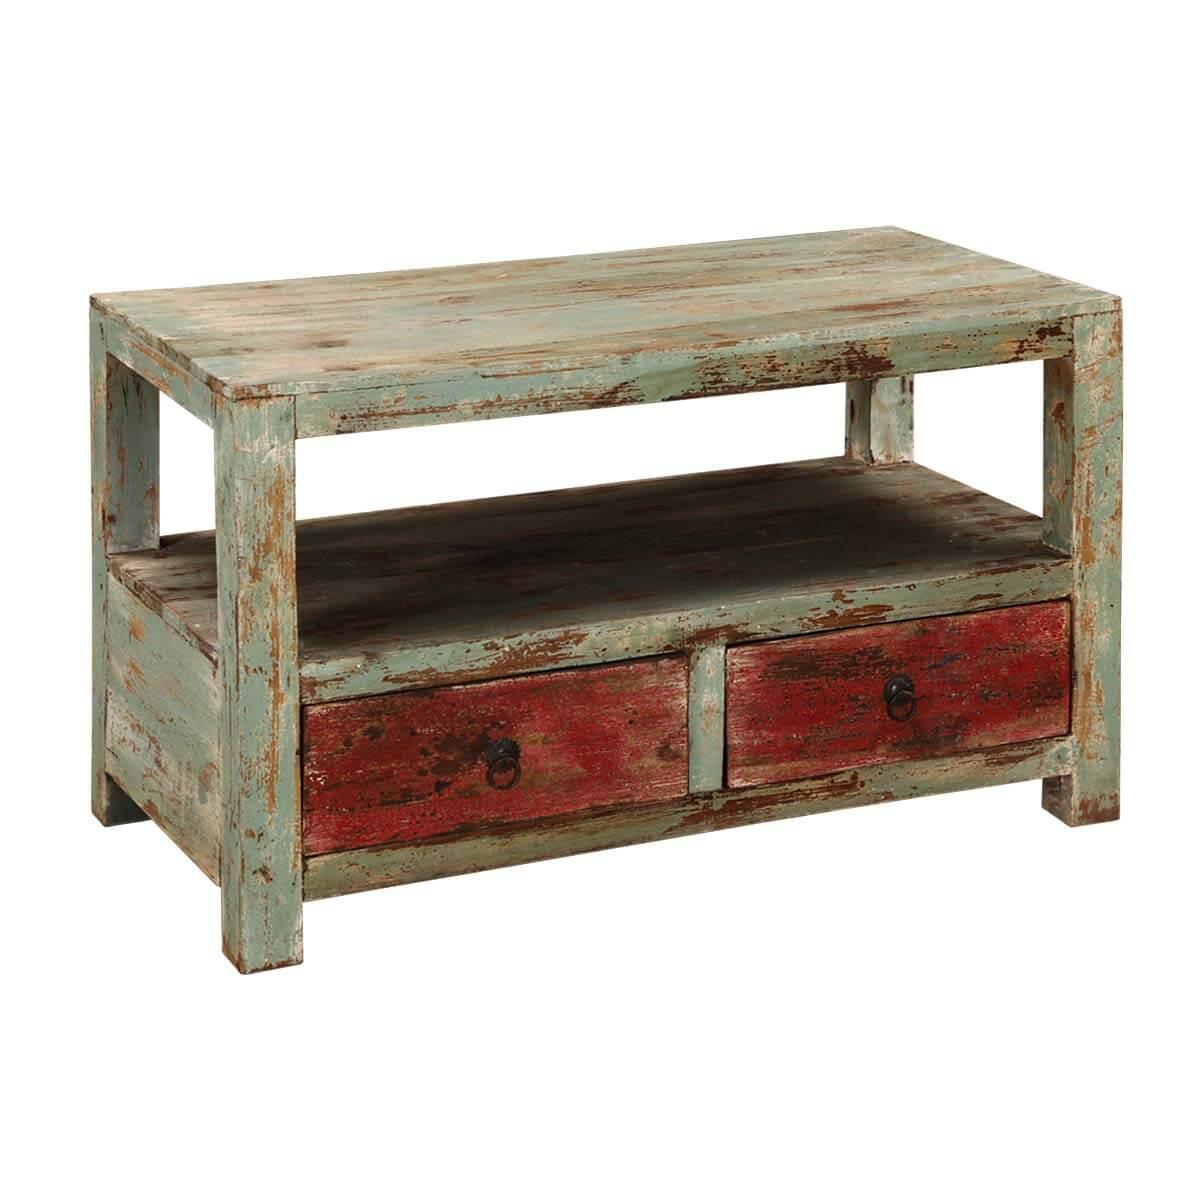 Appalachian Rustic Mango Wood 2-tier Coffee Table w Drawers